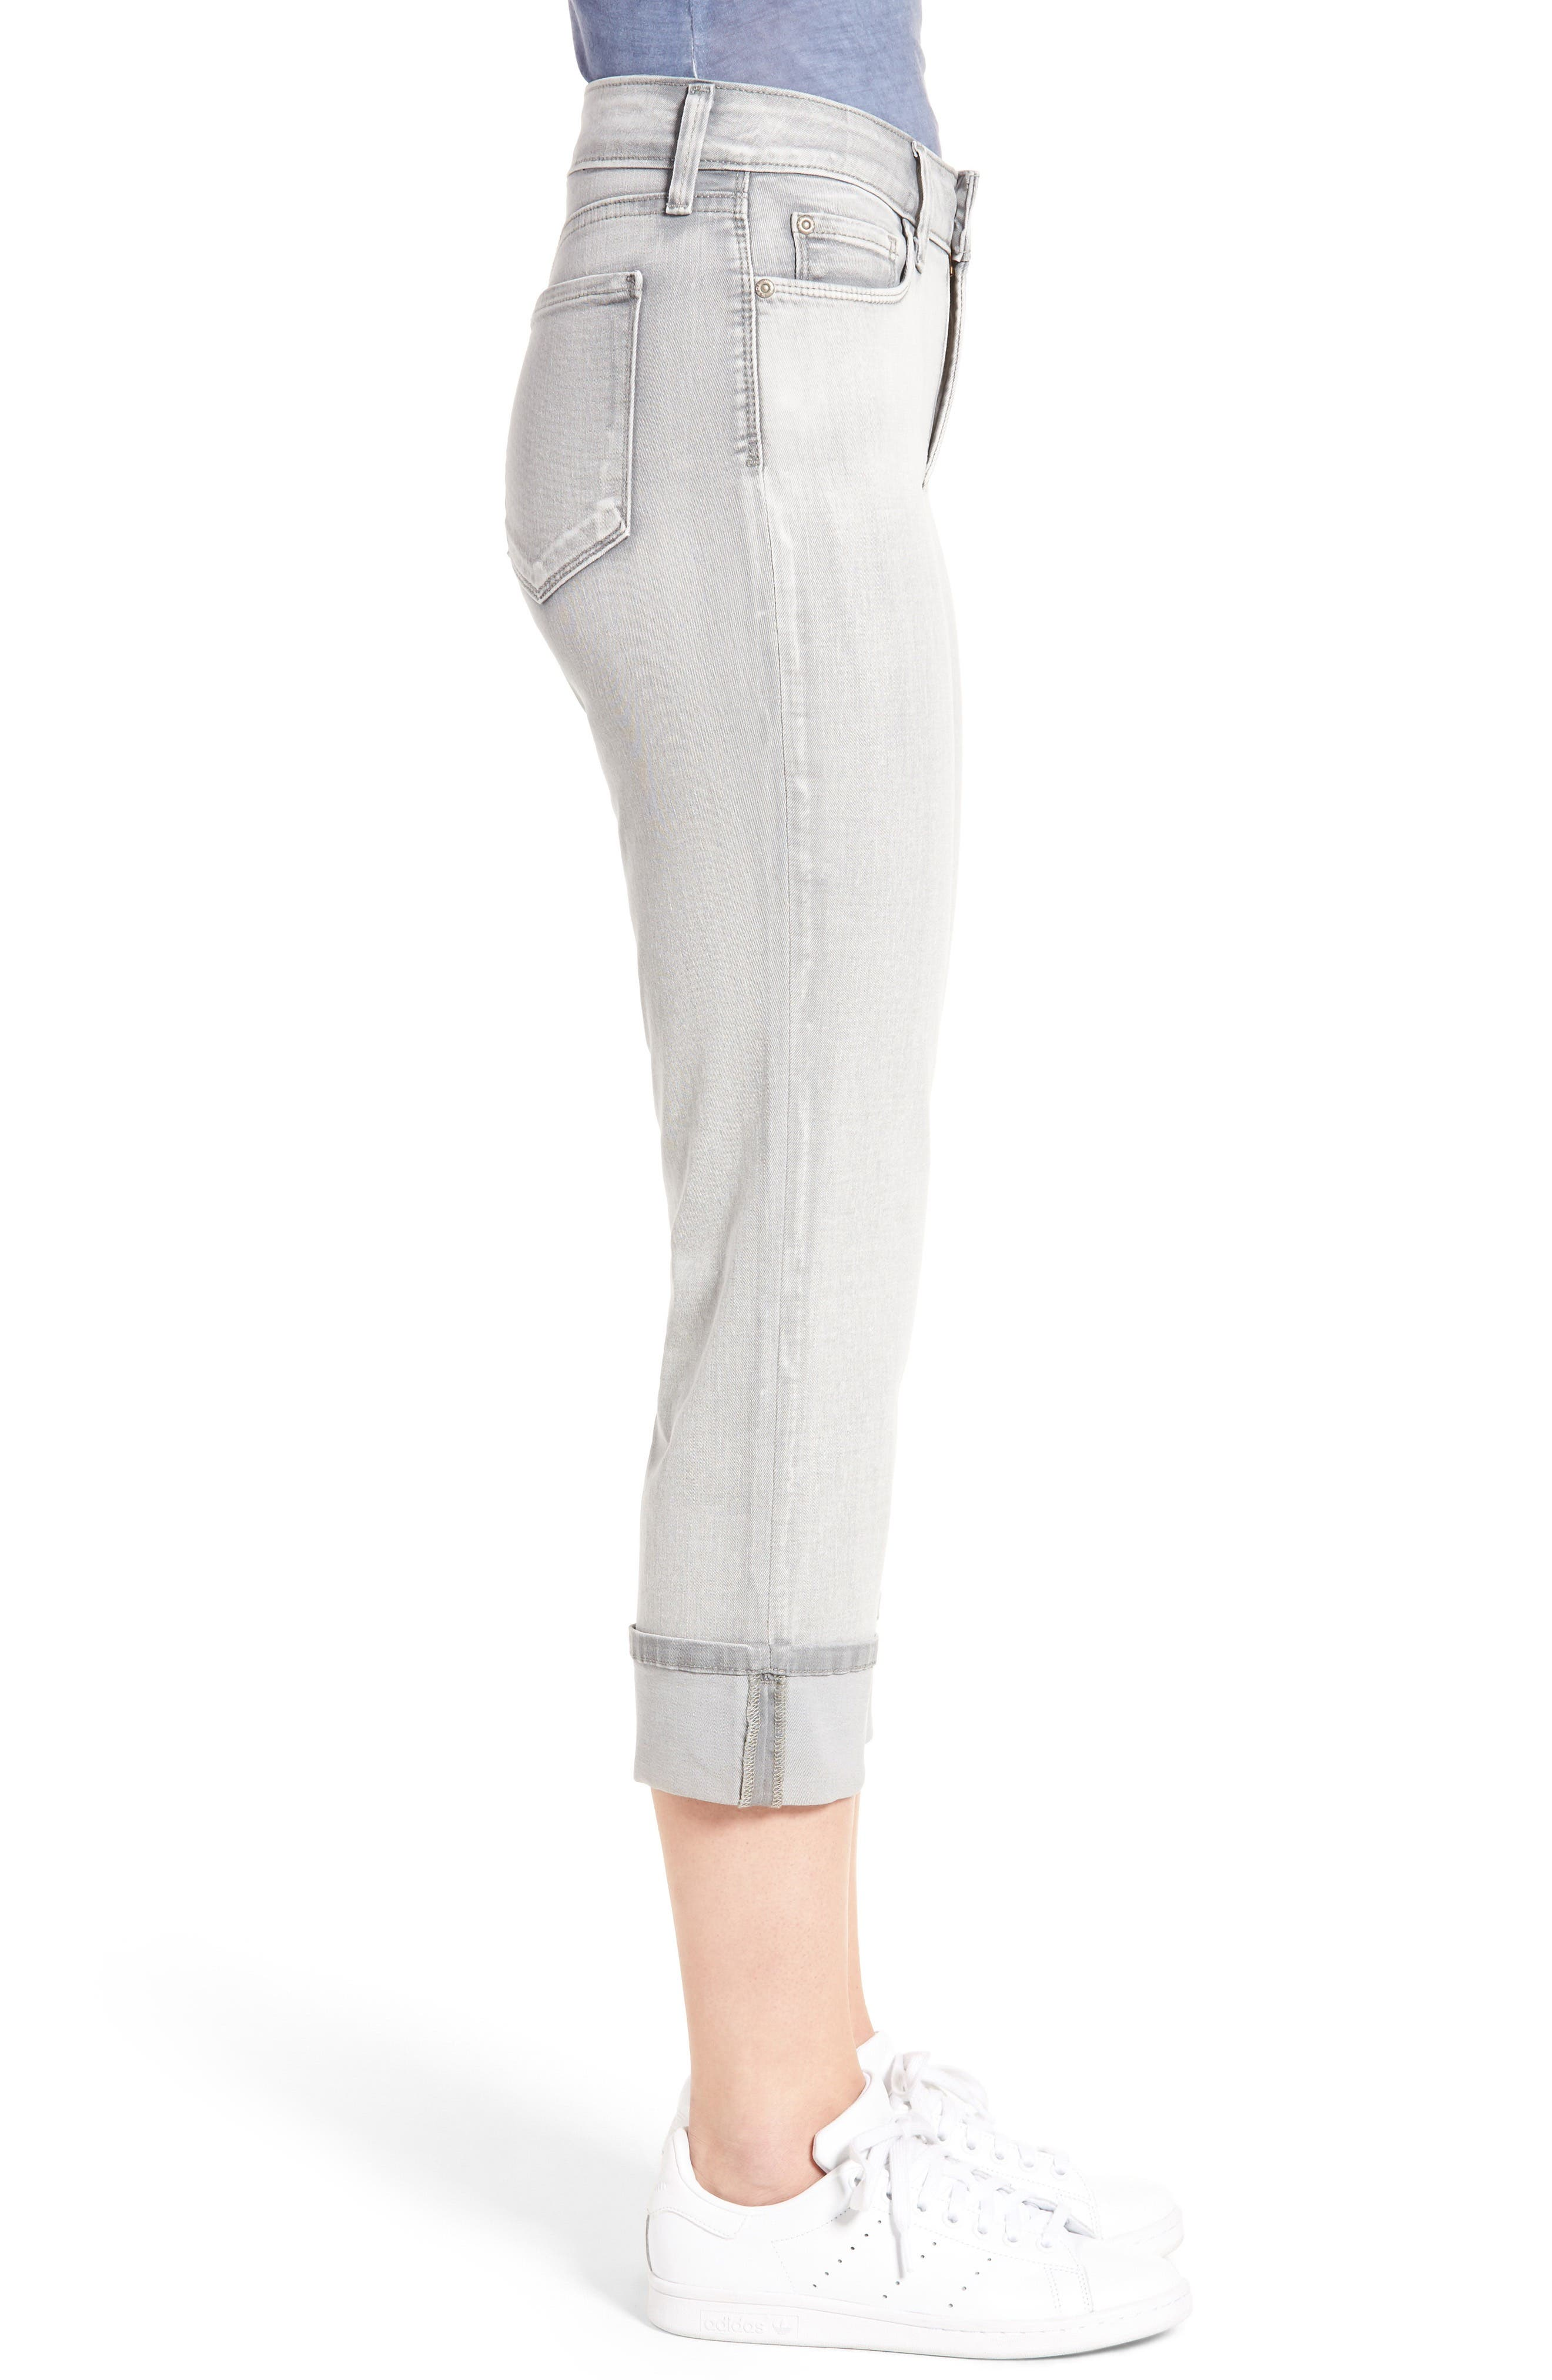 'Dayla' Colored Wide Cuff Capri Jeans,                             Alternate thumbnail 30, color,